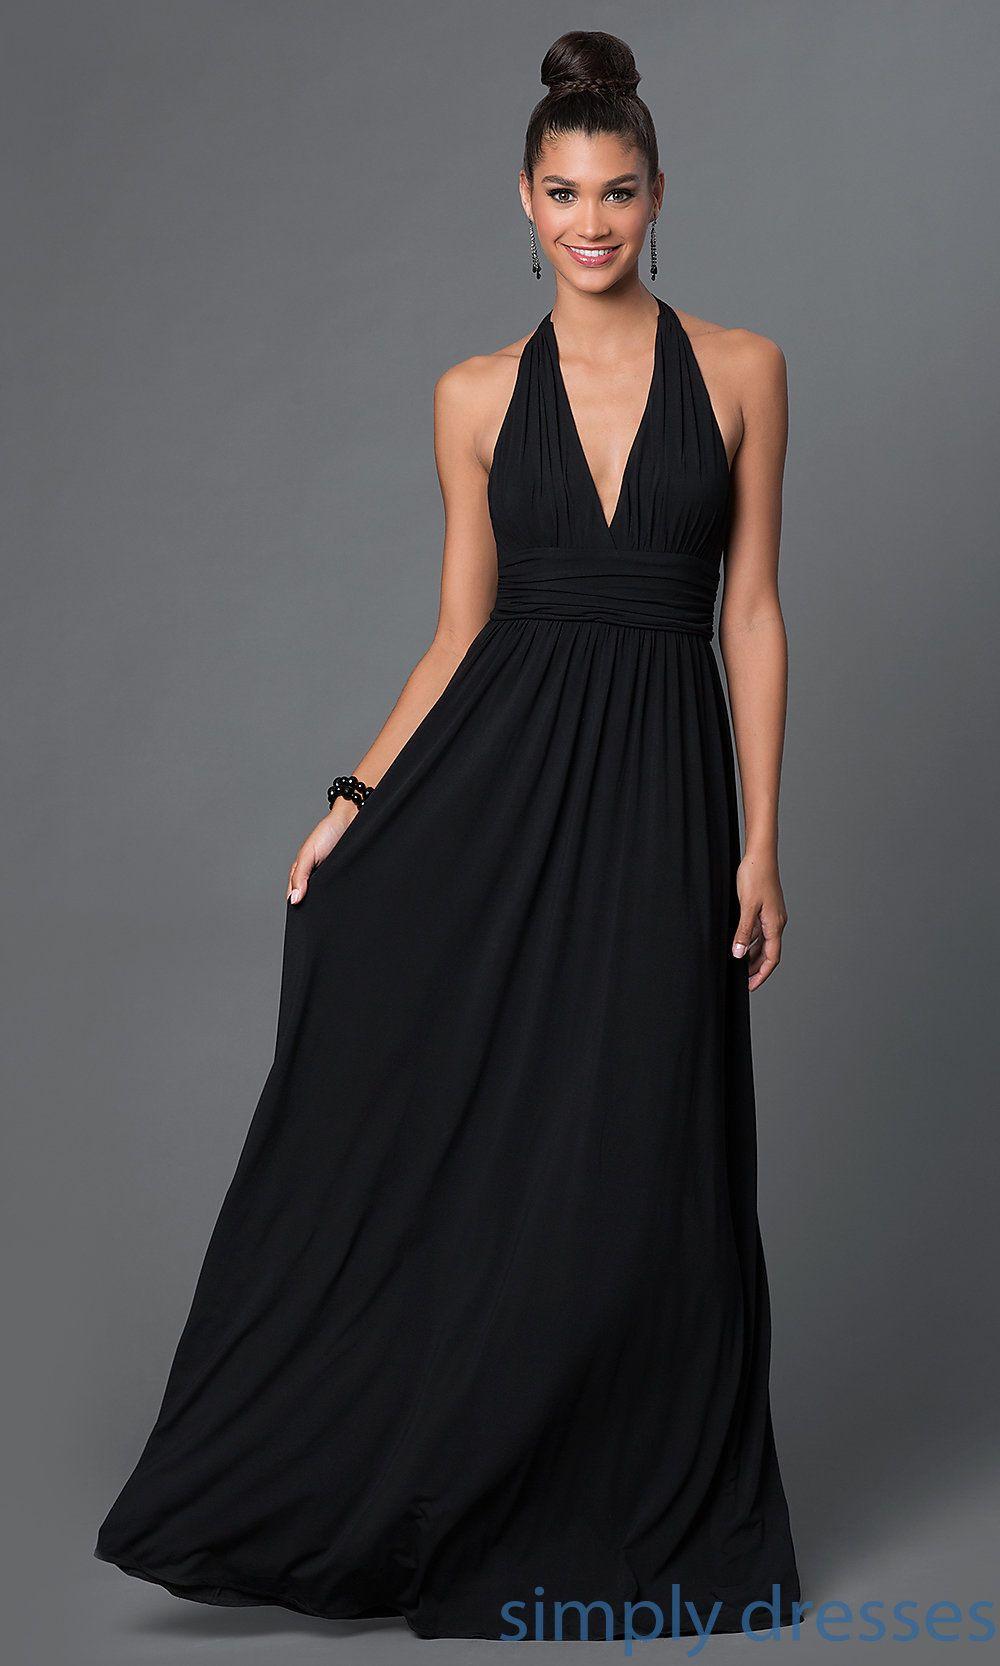 Black dress long formal - Long Black Formal Halter Dress